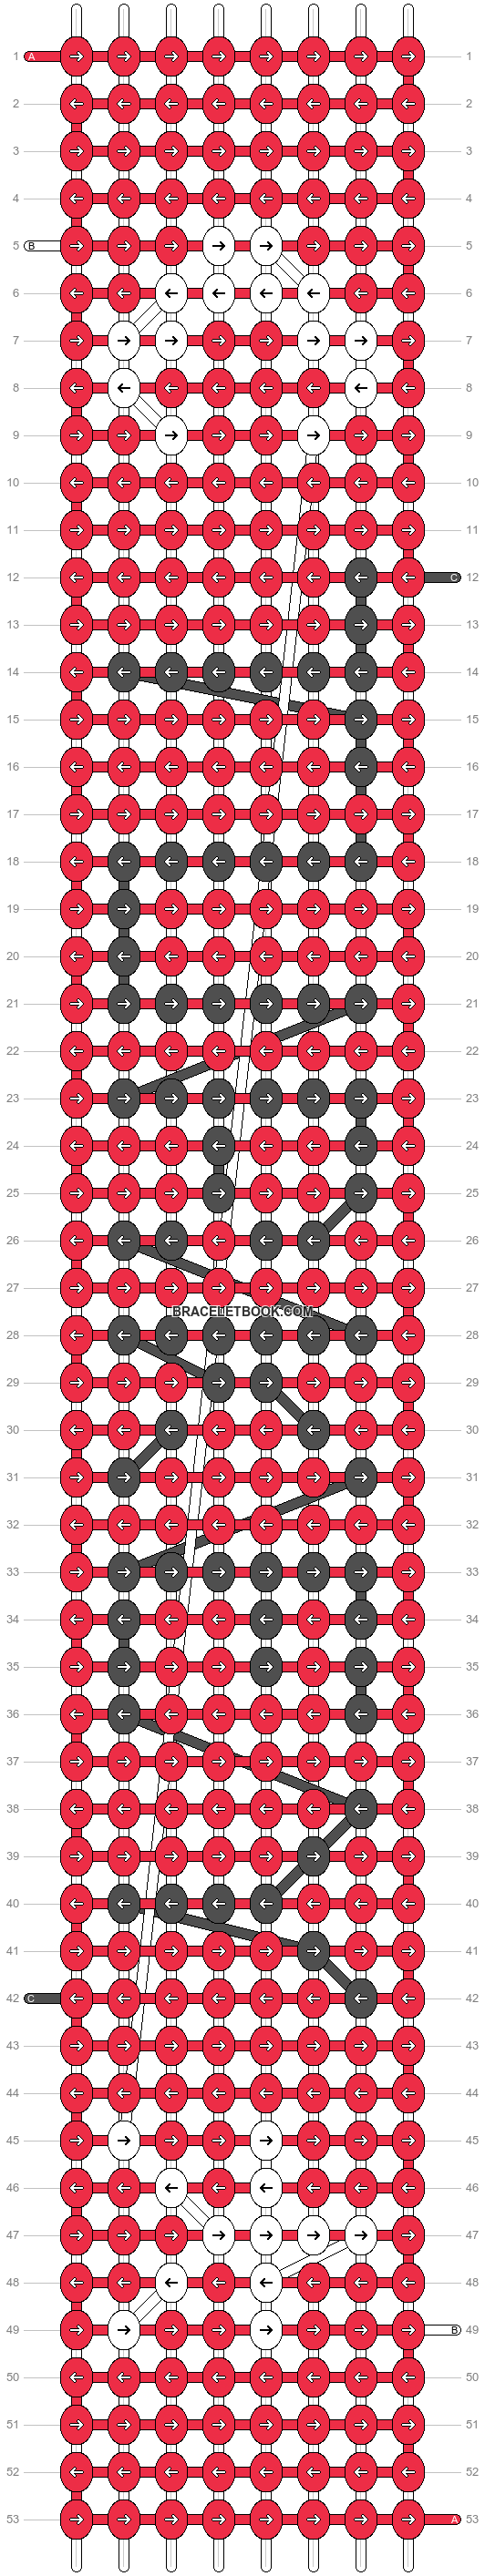 Alpha pattern #16754 pattern